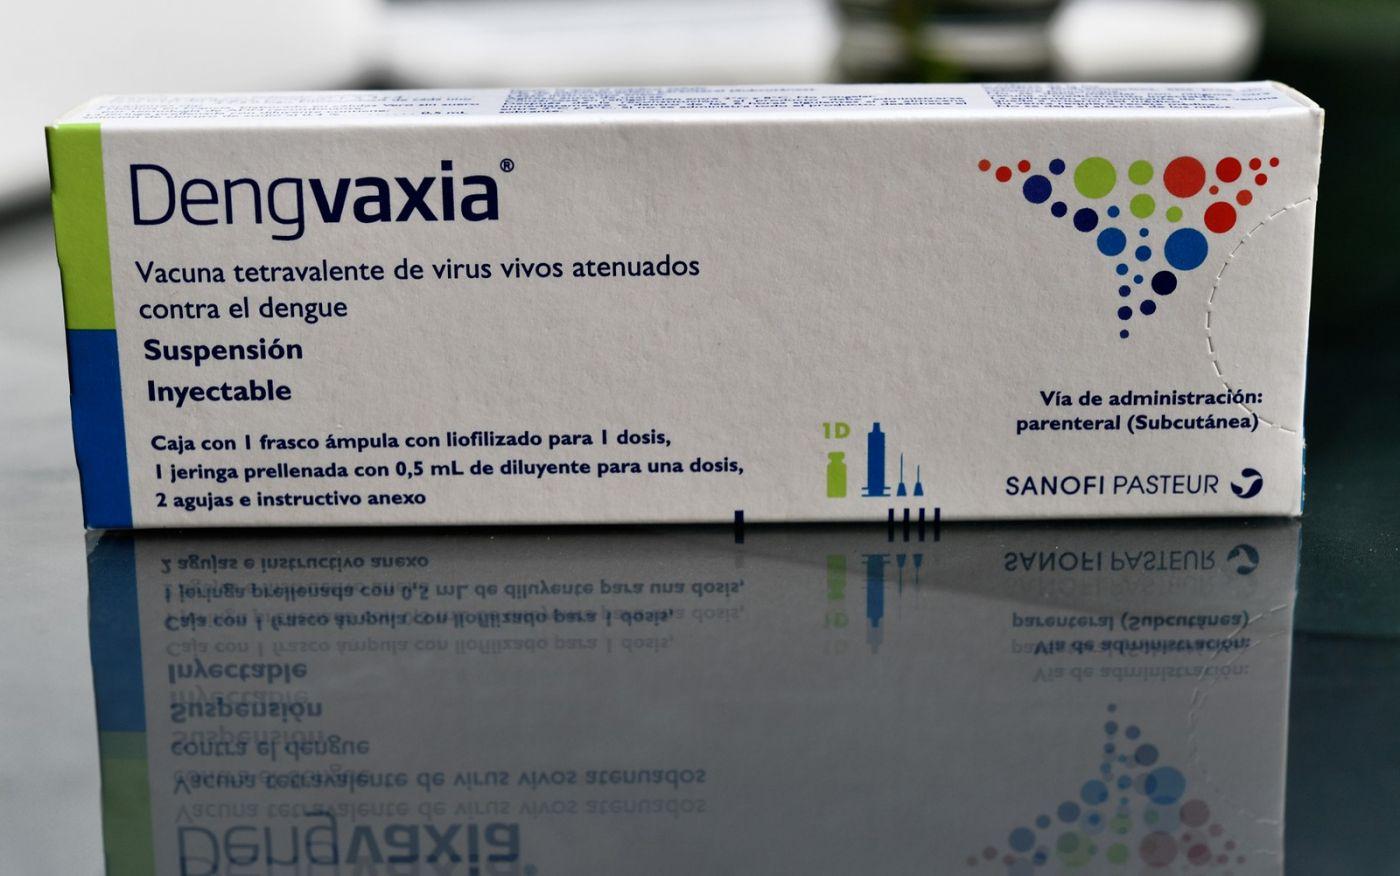 OMS recomenda exames antes de vacina contra dengue da Sanofi